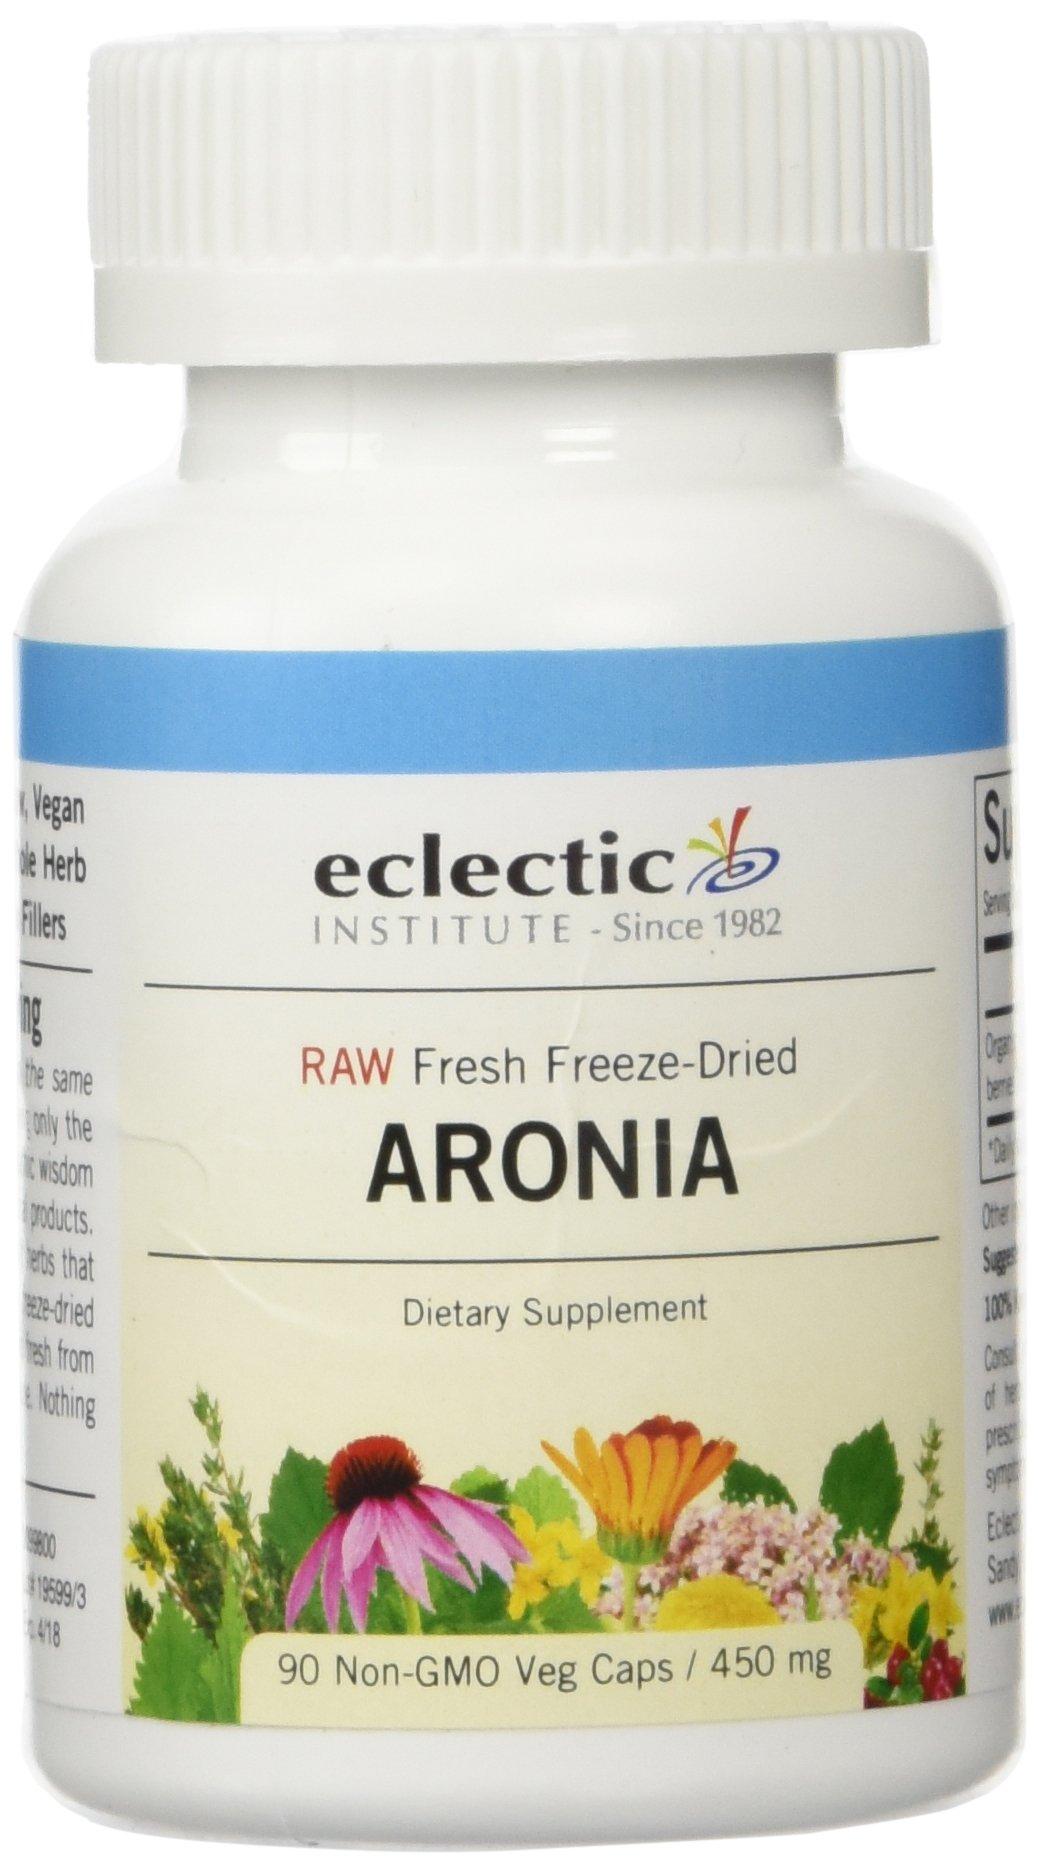 Aronia Berry Freeze-Dried, 450 mg, 90 VegCap, Great Antioxidant